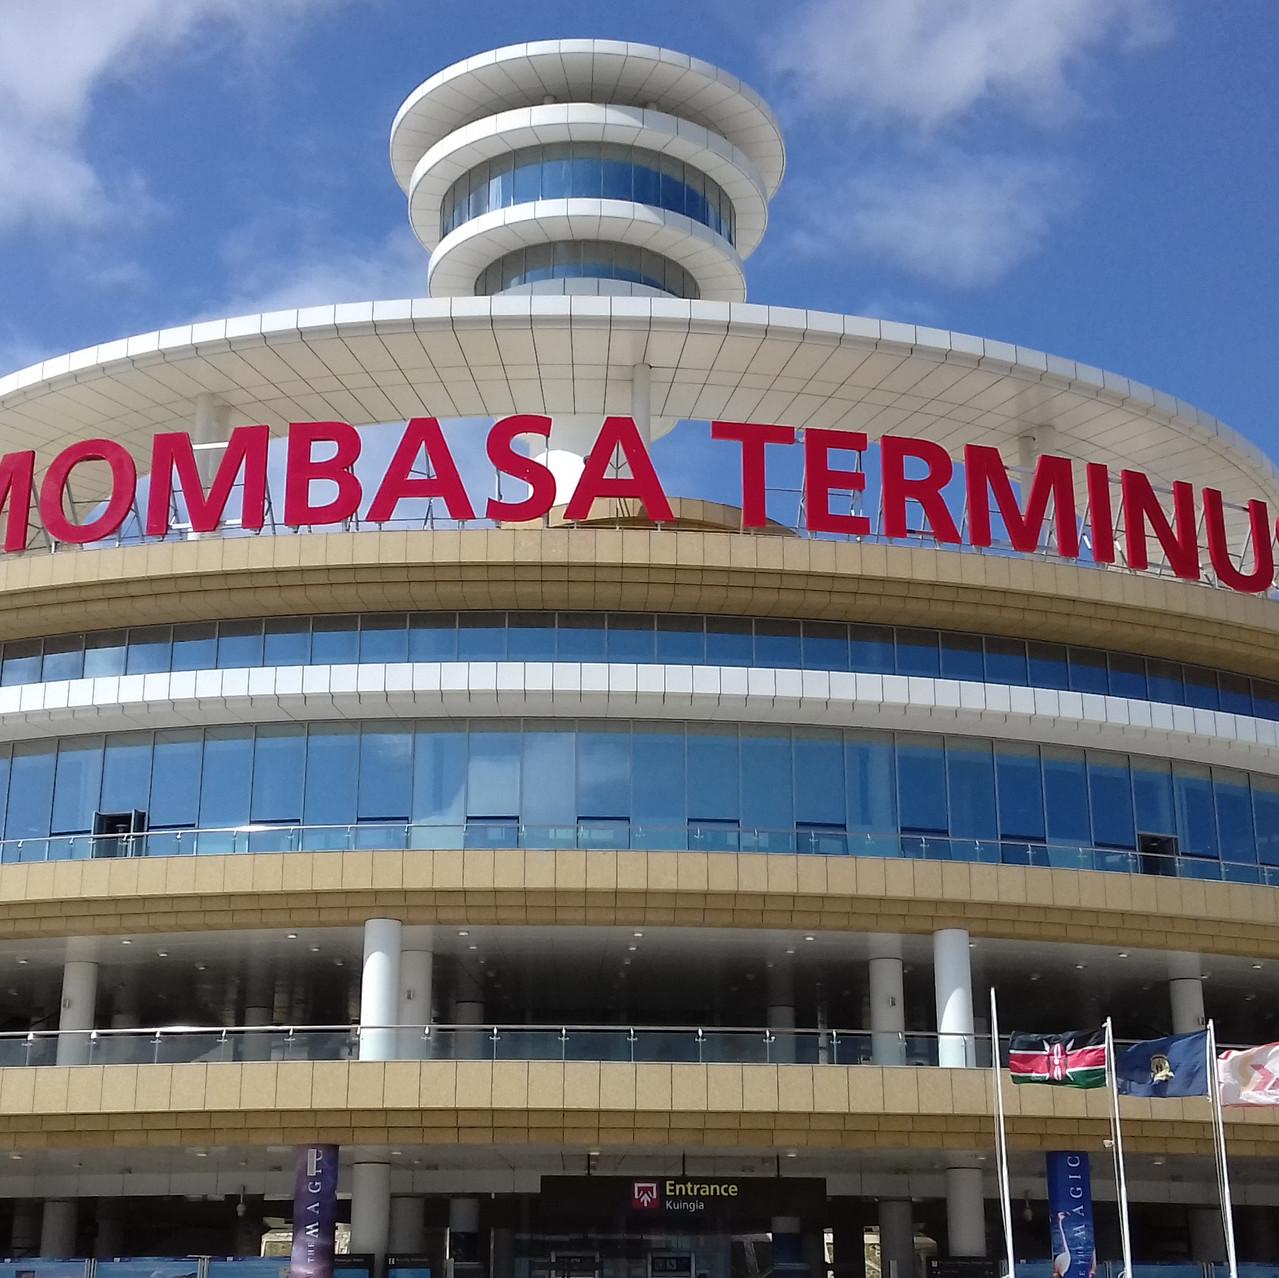 Gare de Mombasa